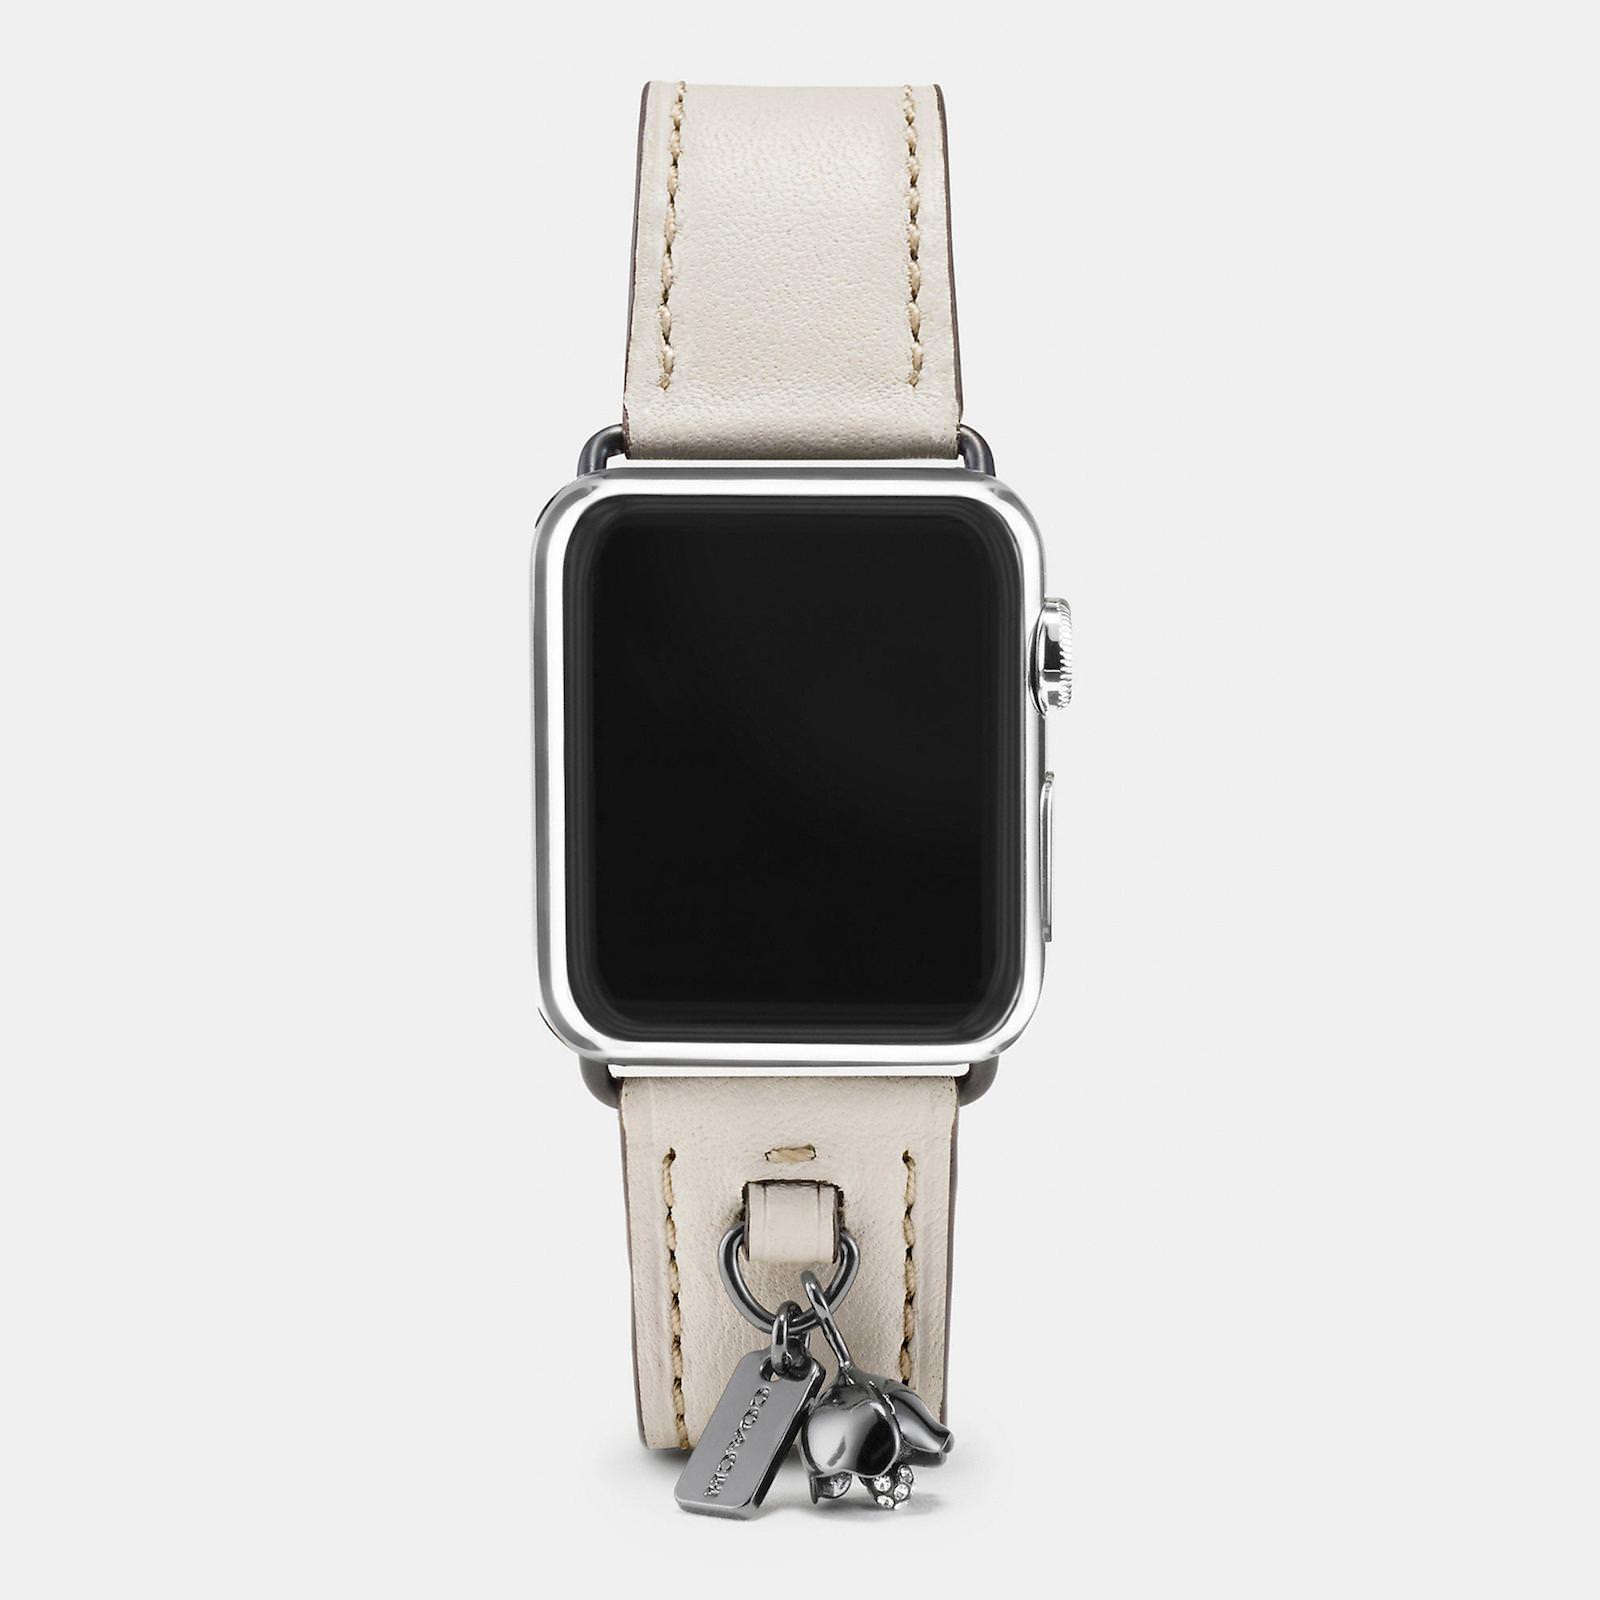 Apple-Watch-Coach-Band-Autumn-Season-7.jpeg